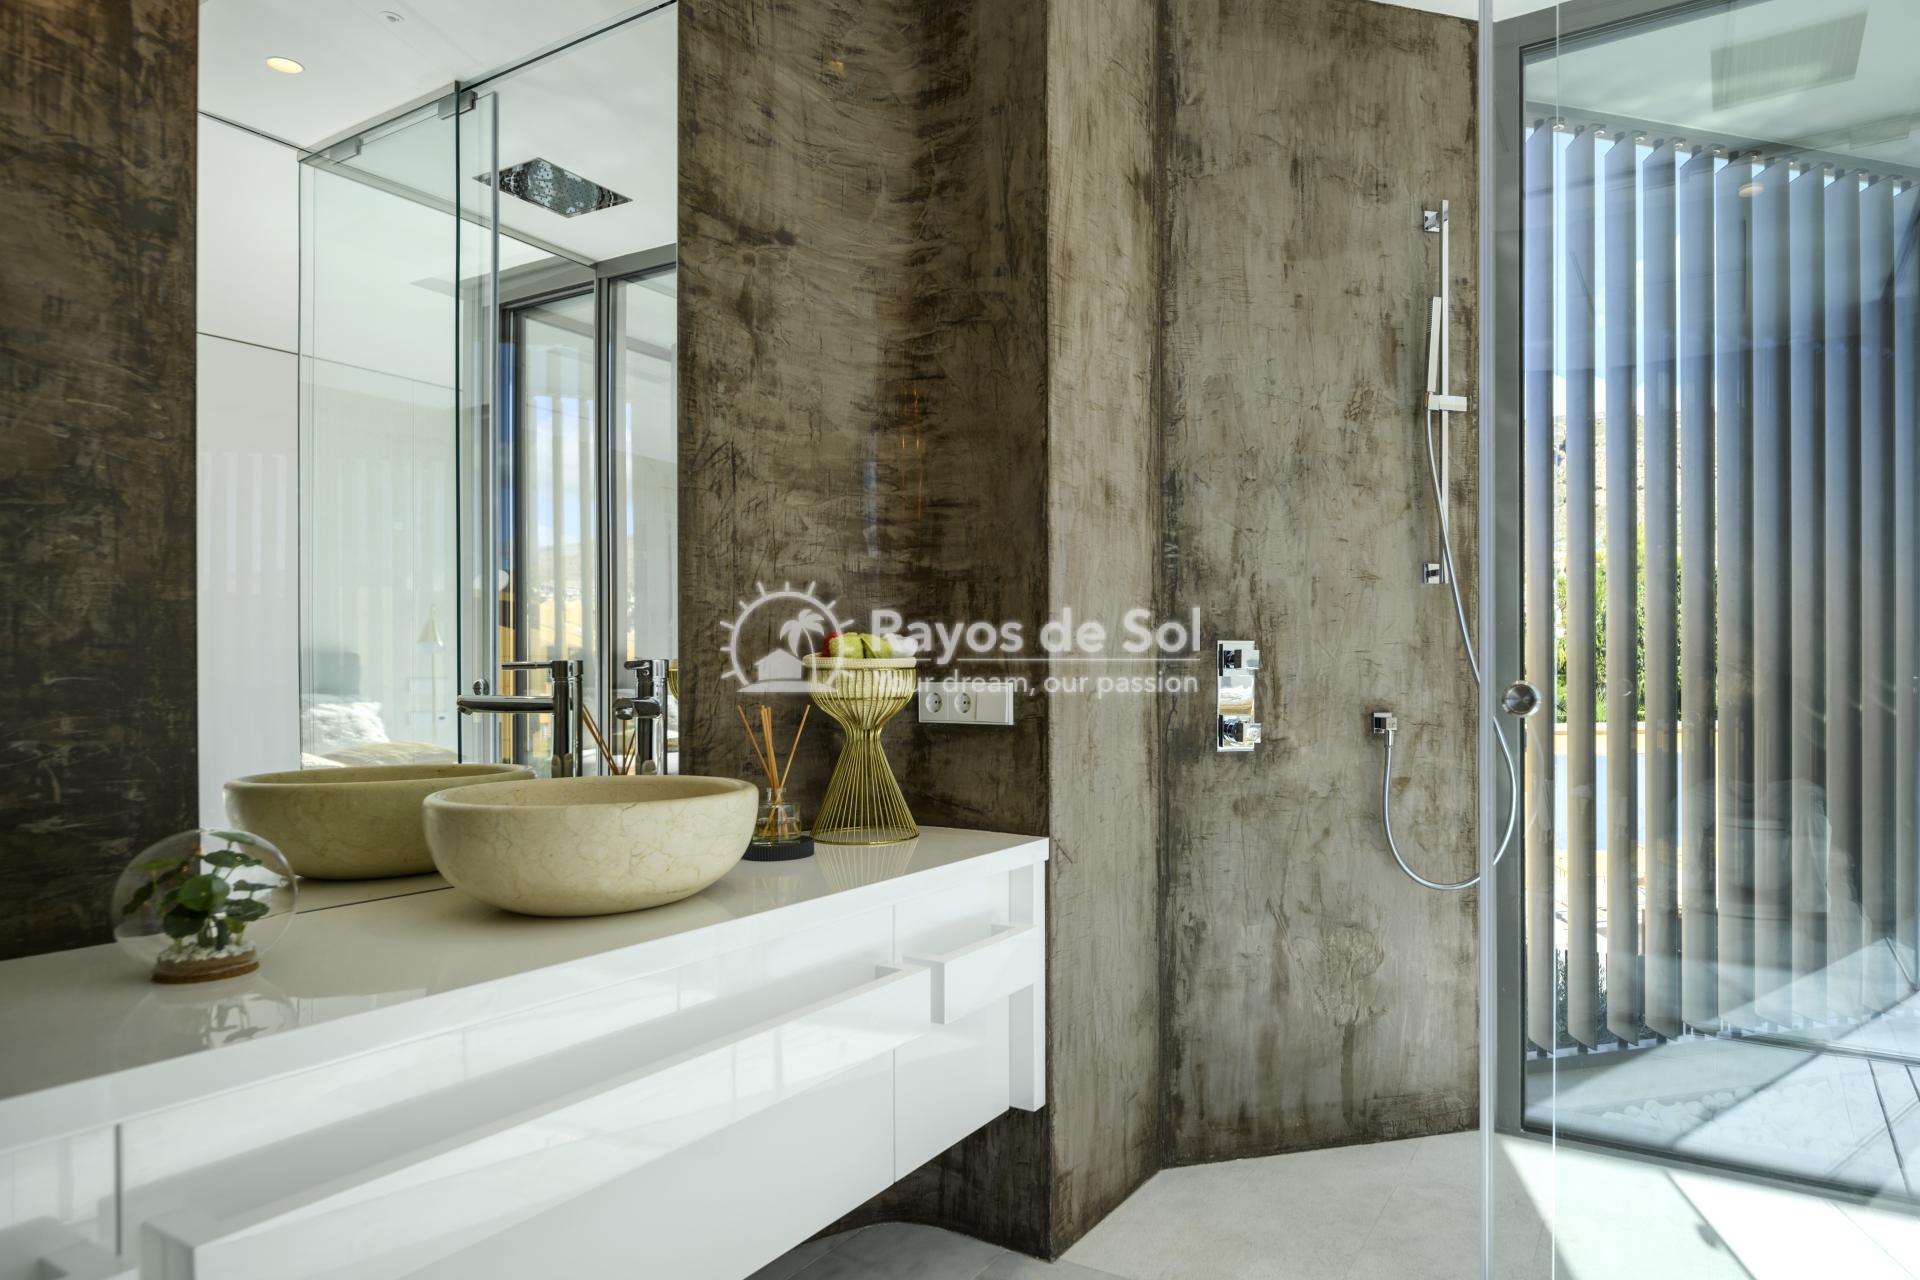 Stunning modern design villa  in Sierra Cortina, Finestrat, Costa Blanca (Praga 19) - 29